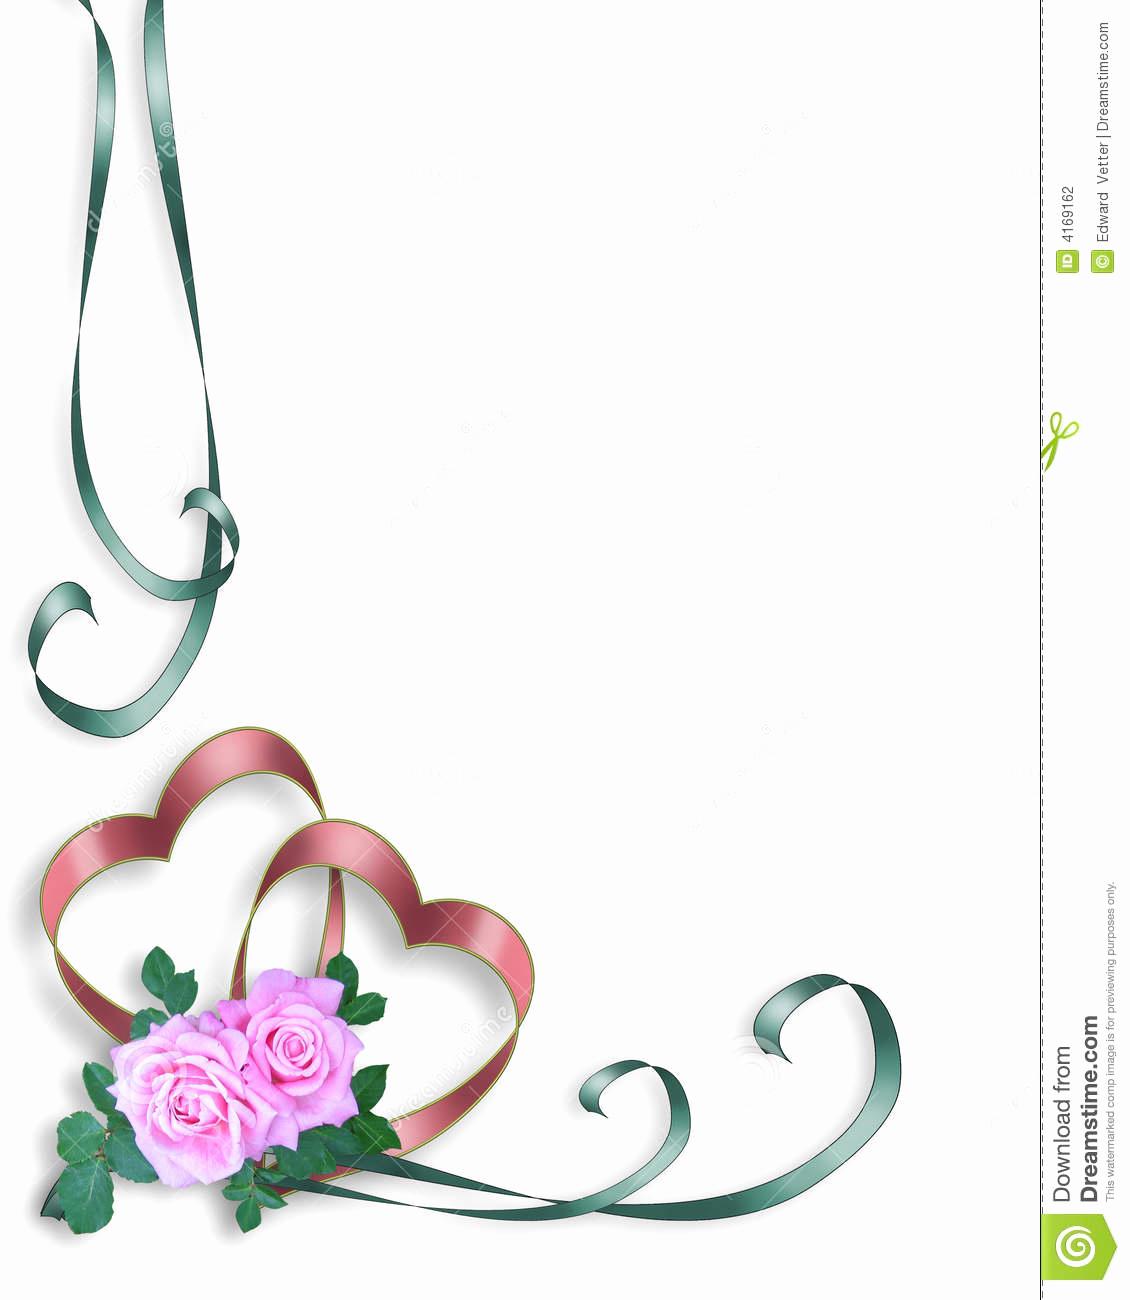 Wedding Invitation Borders Design New Wedding Invitation Border Hearts and Pink Roses Stock